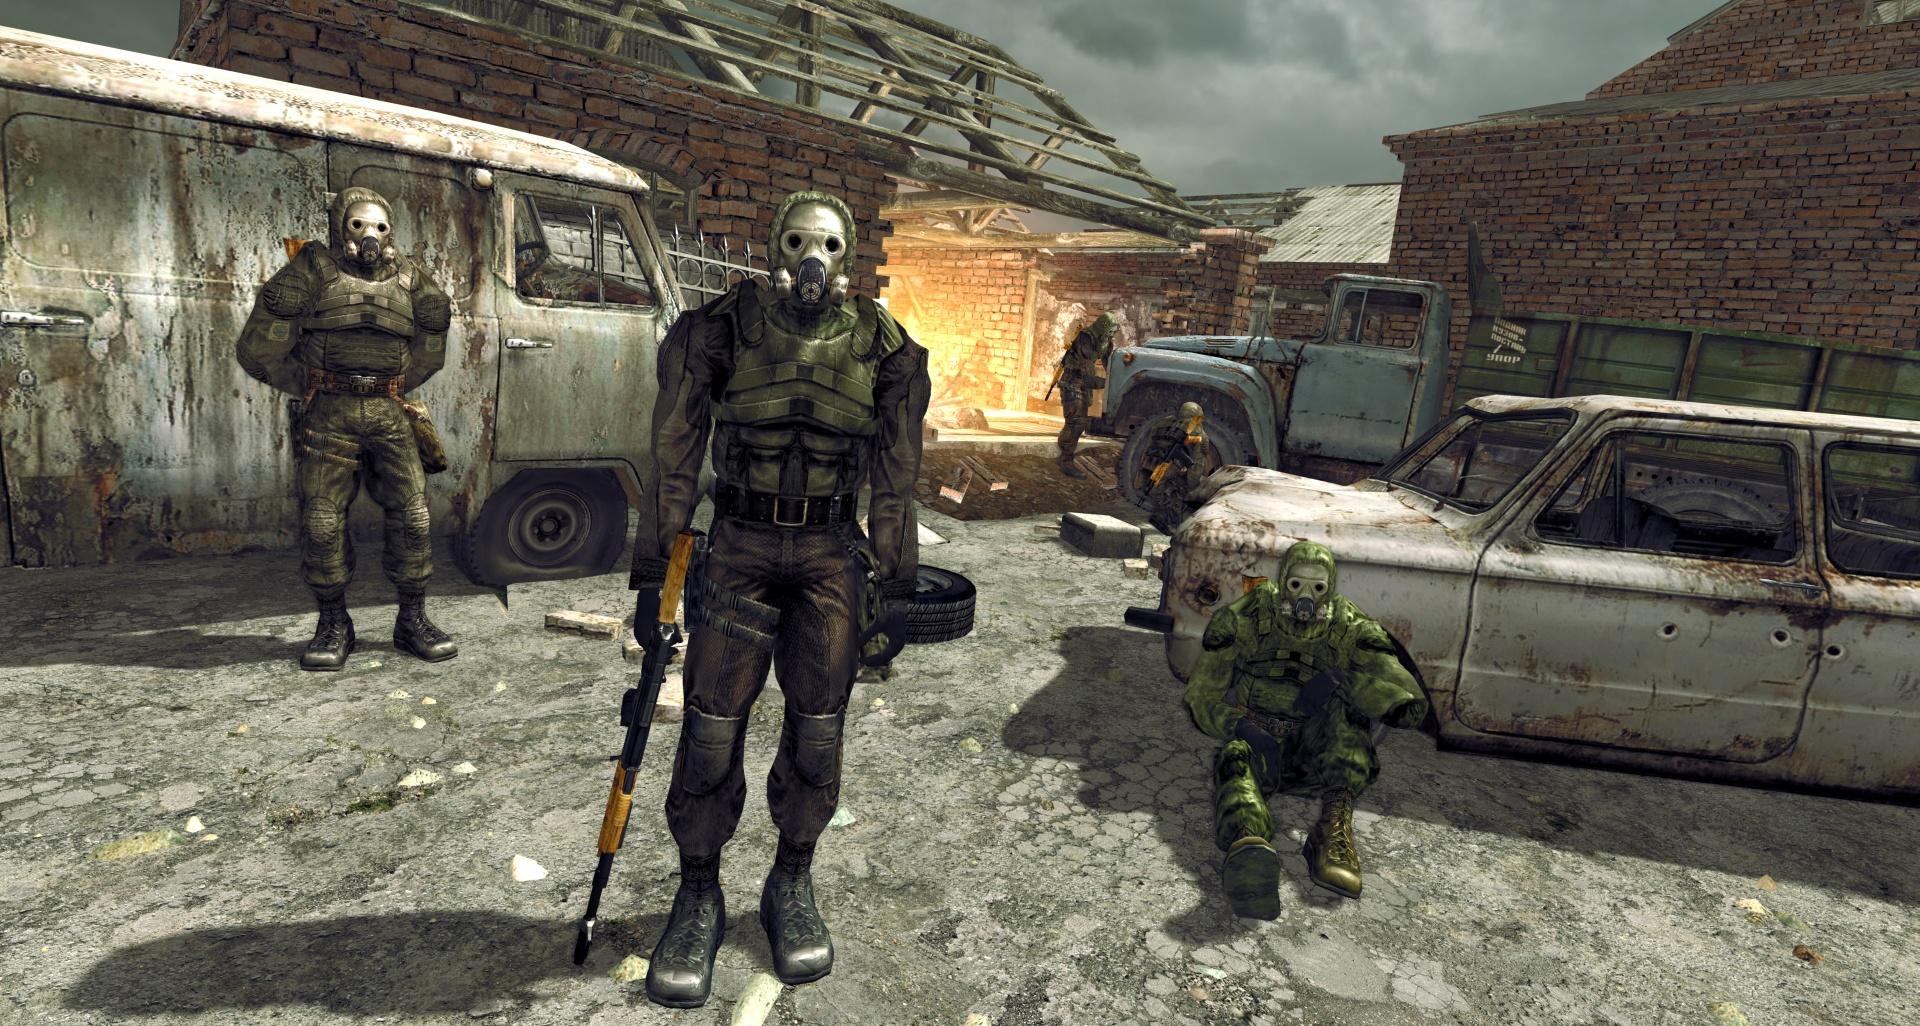 Графику первой части S.T.A.L.K.E.R. «обновляют» при помощи движка CryEngine 3